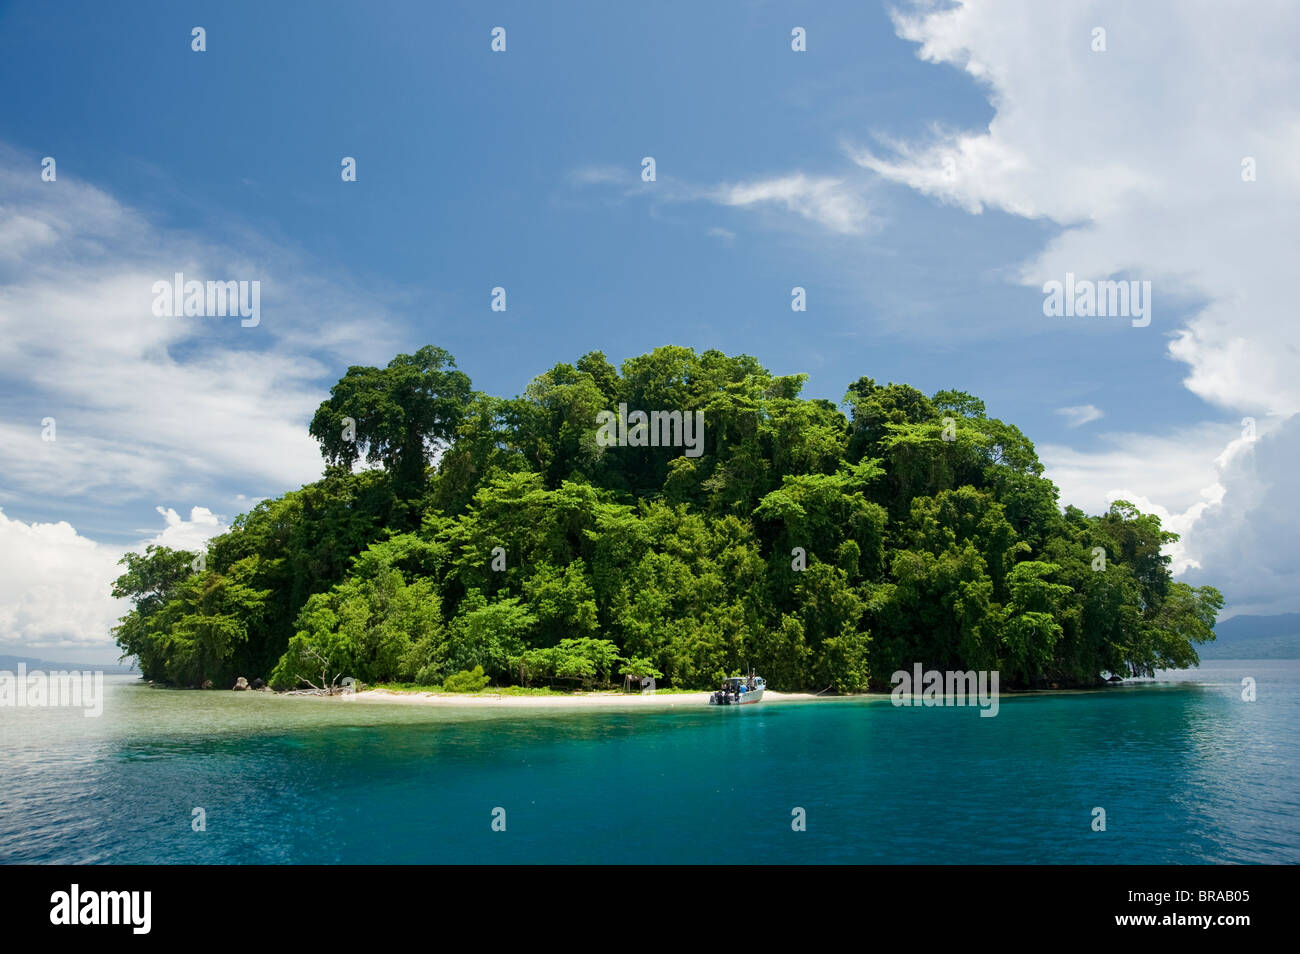 Restorf Island, Papua New Guinea. Indo-pacific - Stock Image